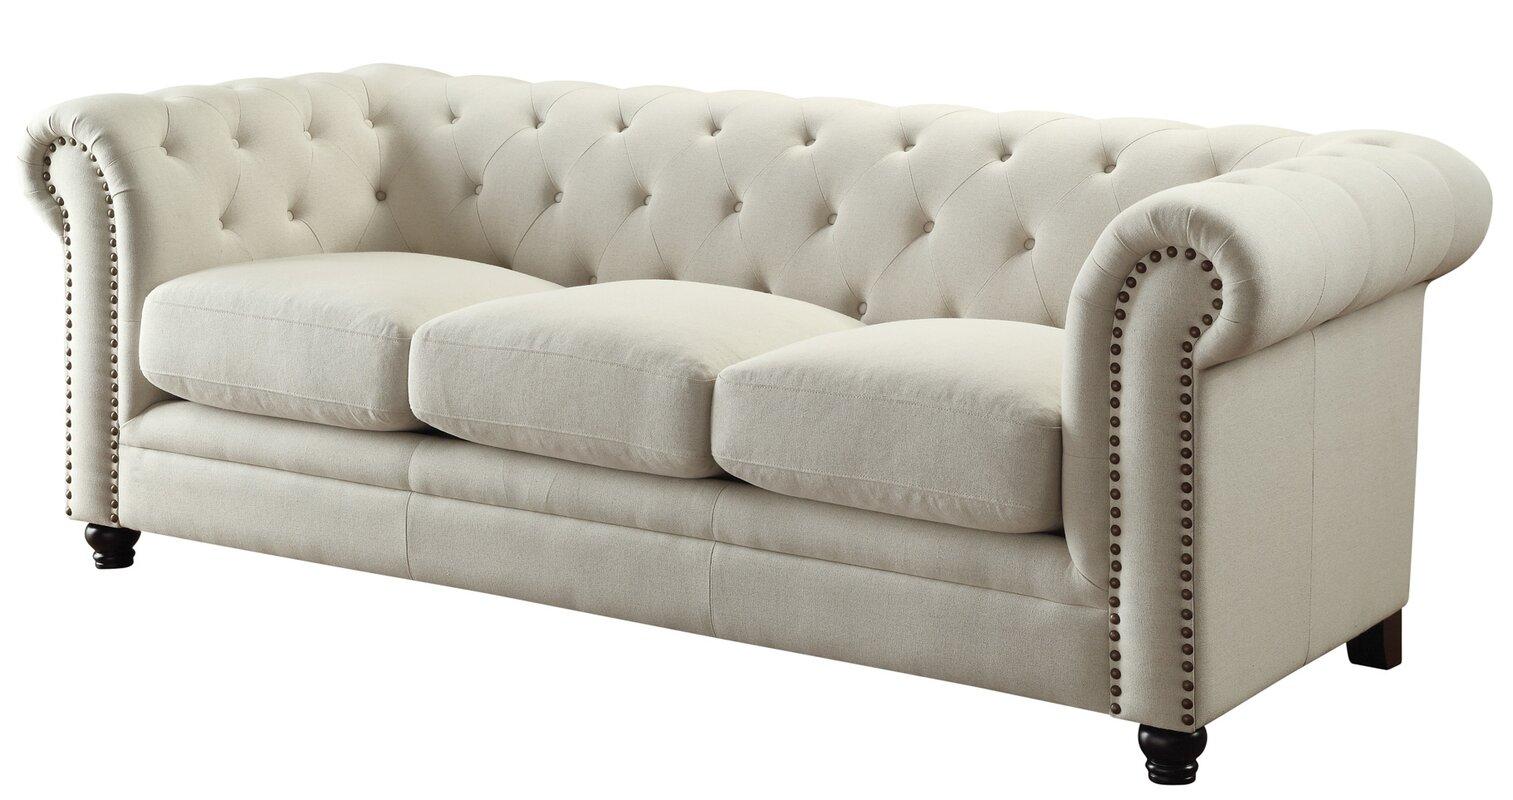 willa arlo interiors dalila upholstered chesterfield sofa reviews wayfair. Black Bedroom Furniture Sets. Home Design Ideas